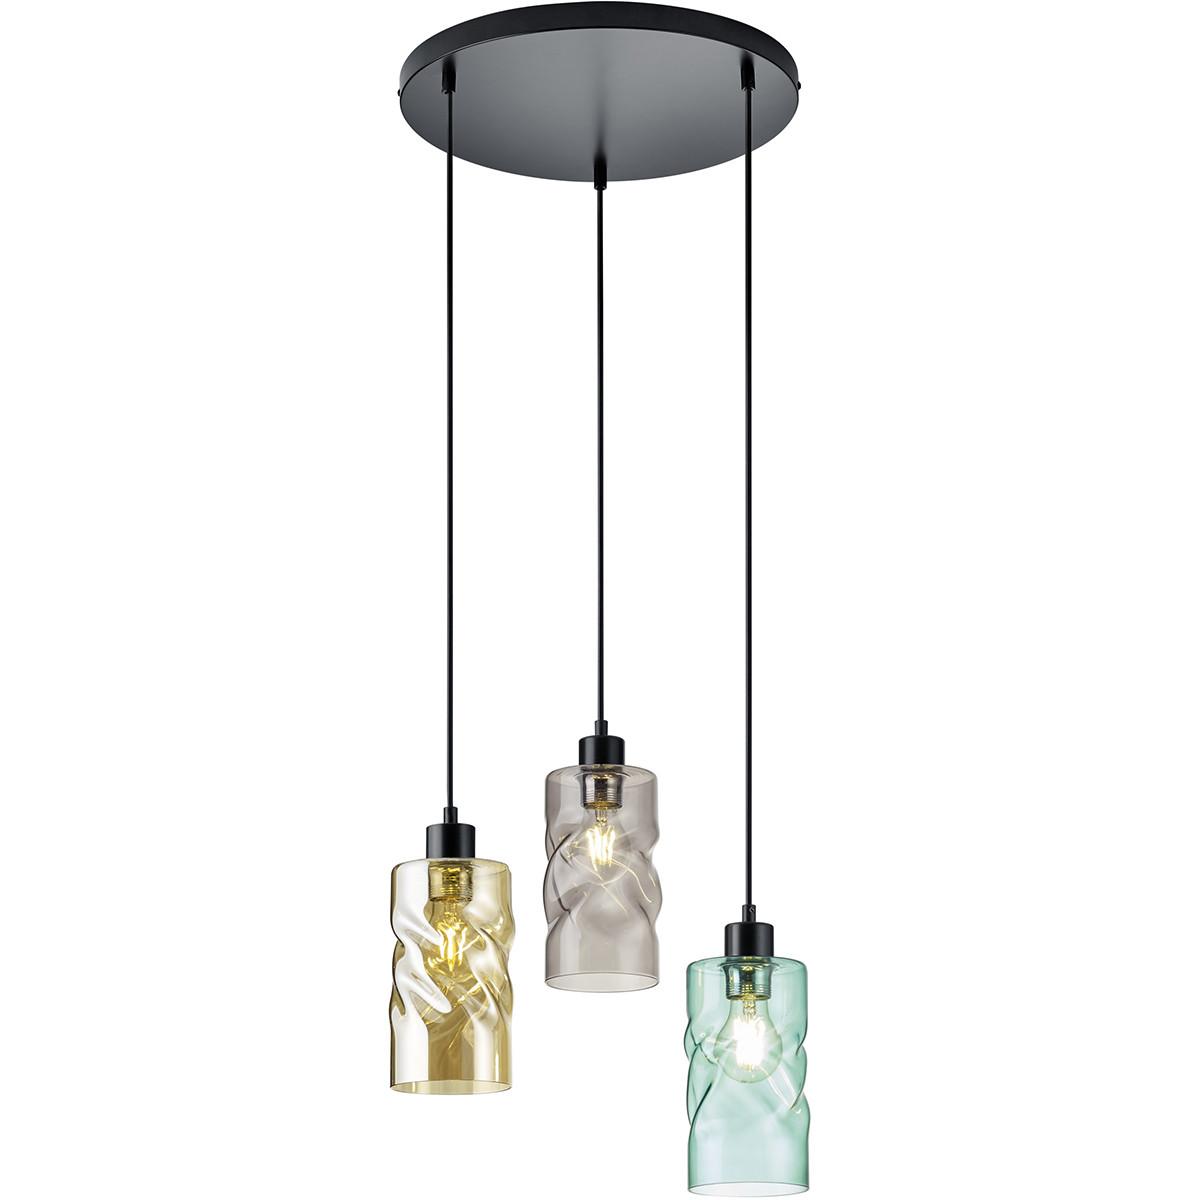 LED Hanglamp - Trion Swily - E27 Fitting - 3-lichts - Rond - Mat Zwart - Aluminium